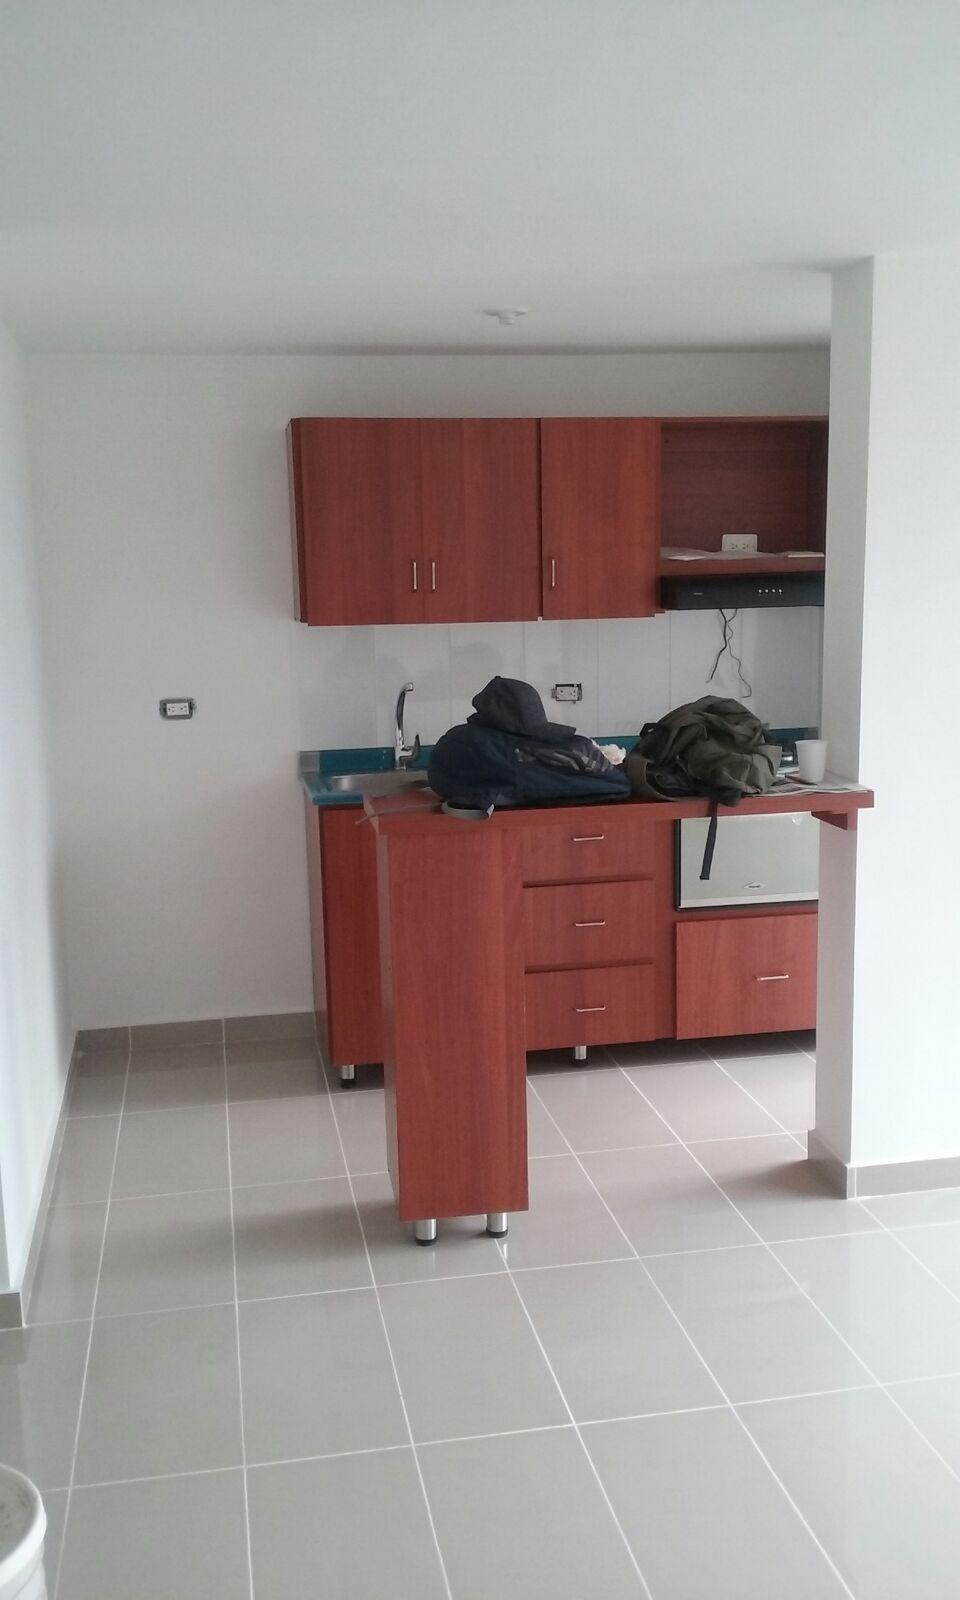 Obra blanca en apartamento vegas plaza sabaneta obra - Muebles de cocina vegasa ...